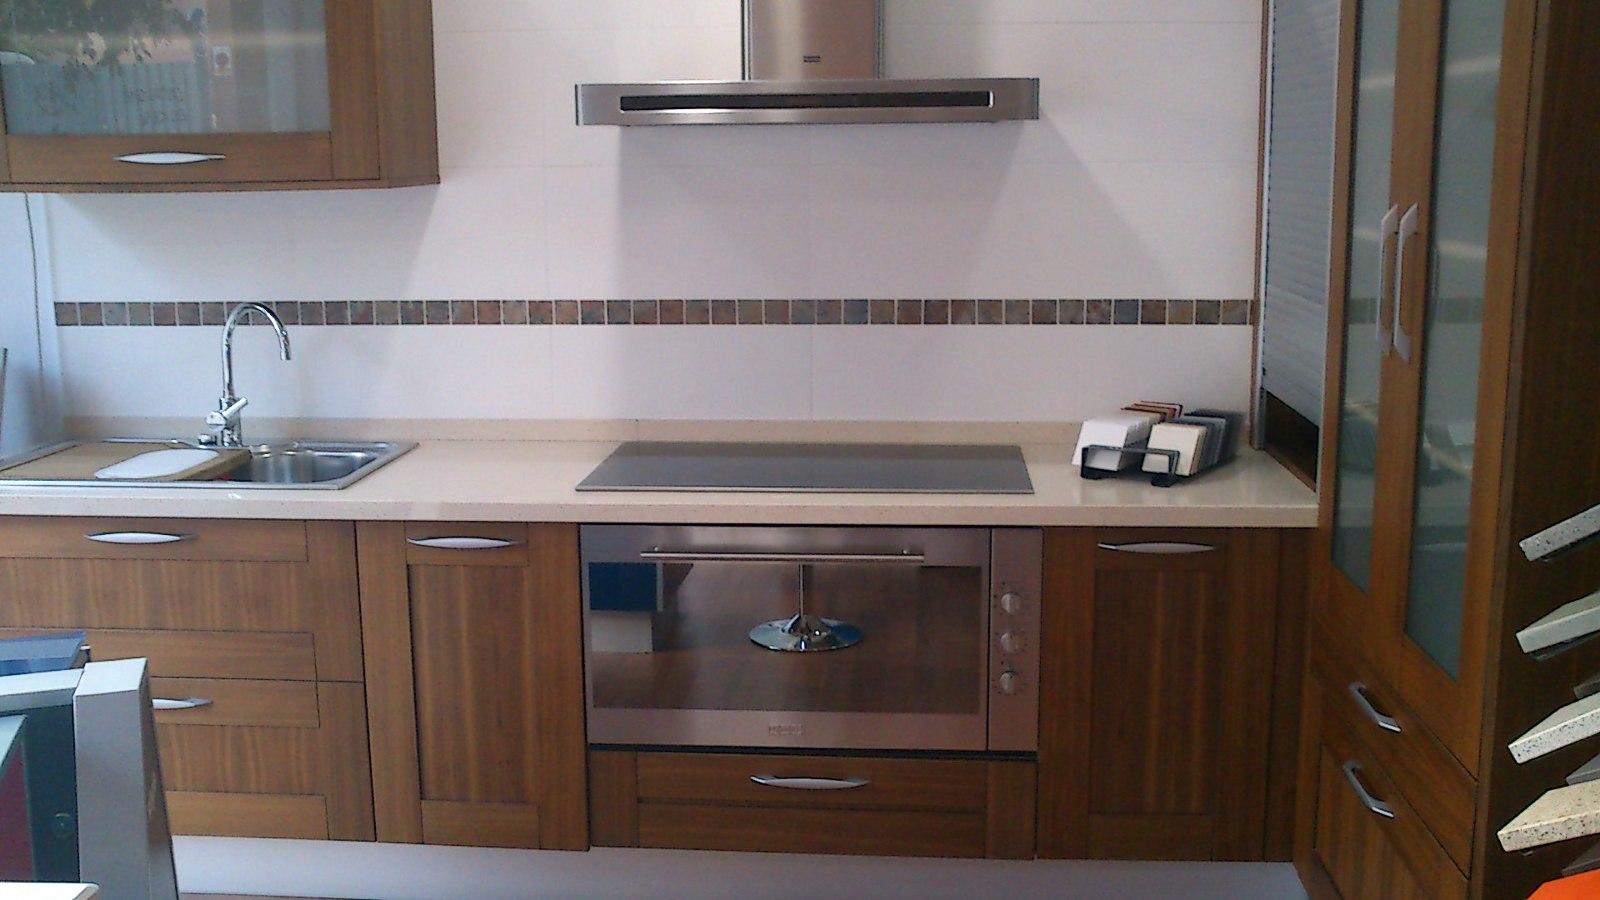 Foto cocina exposici n de rm reformes i materials for Muebles de cocina de exposicion